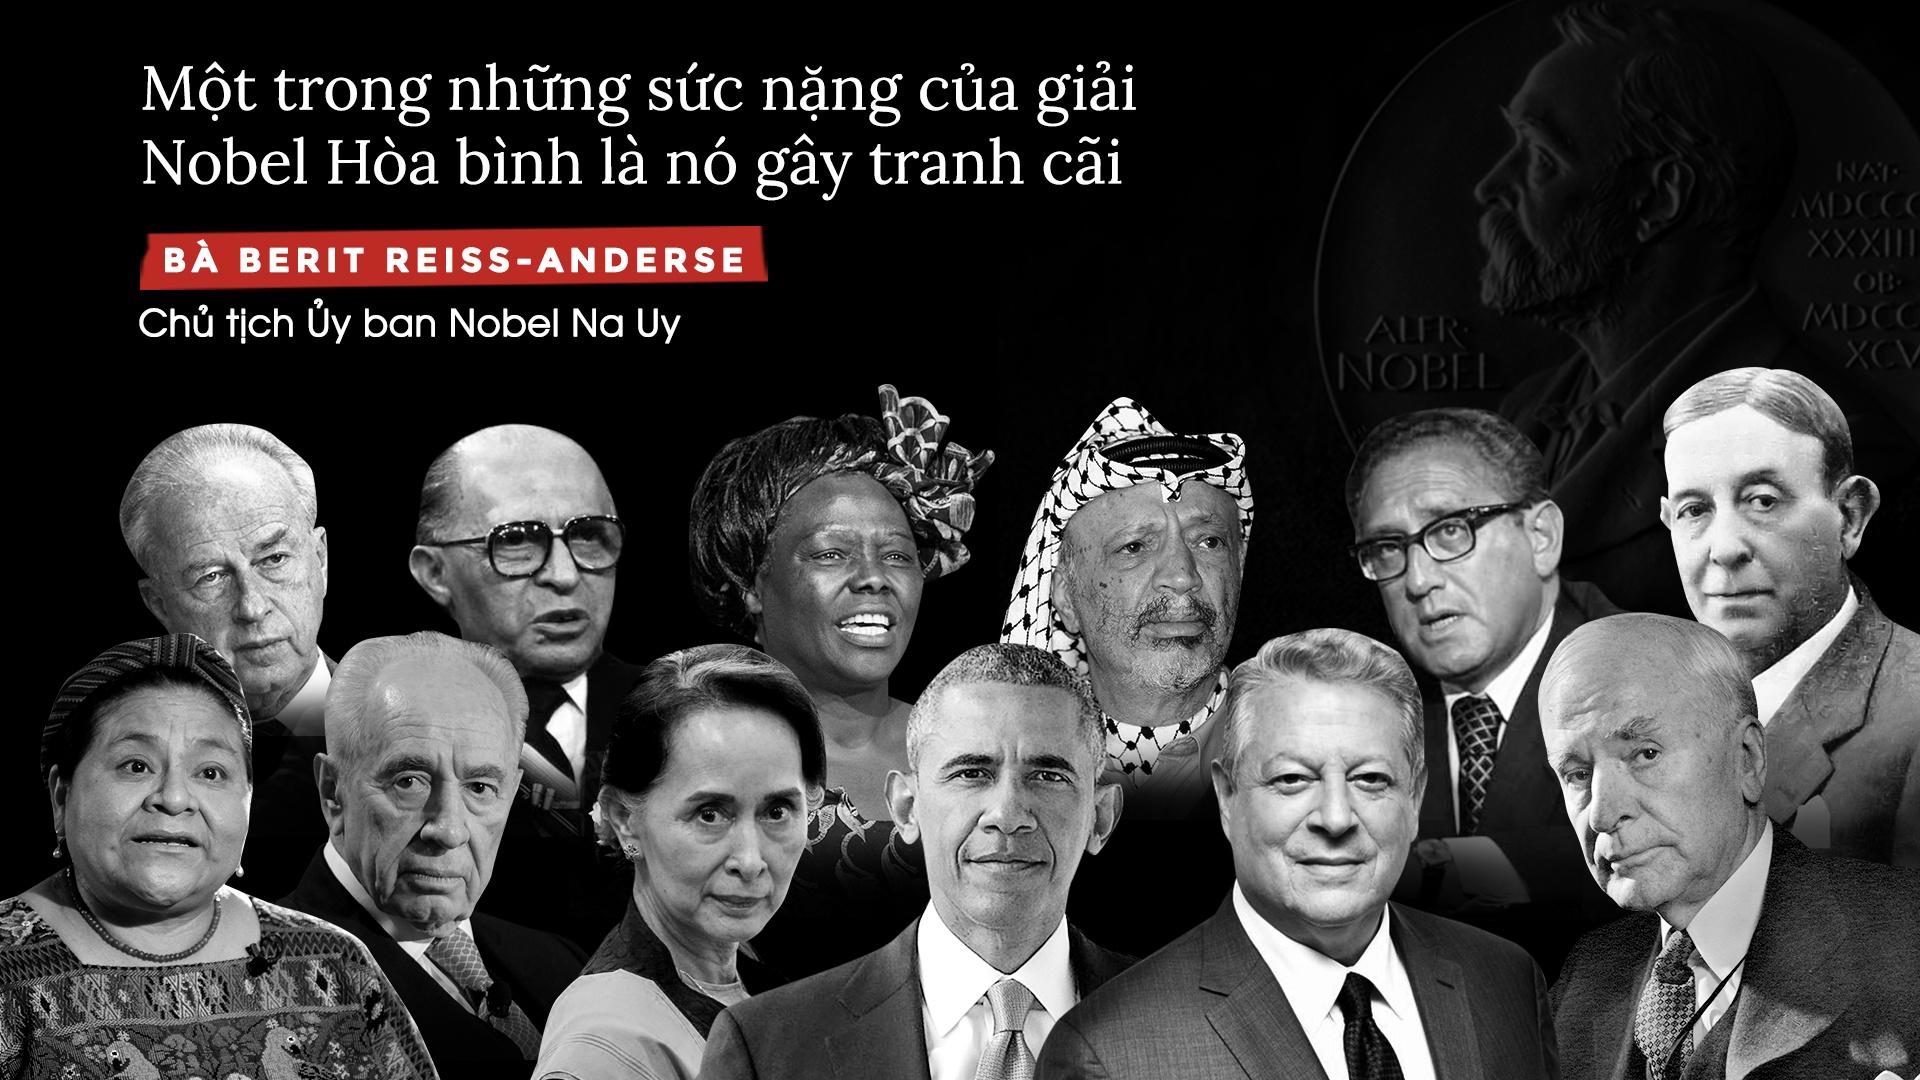 Mua Nobel tranh cai - Huy giai van hoc, TT Trump nhan Nobel Hoa binh? hinh anh 5